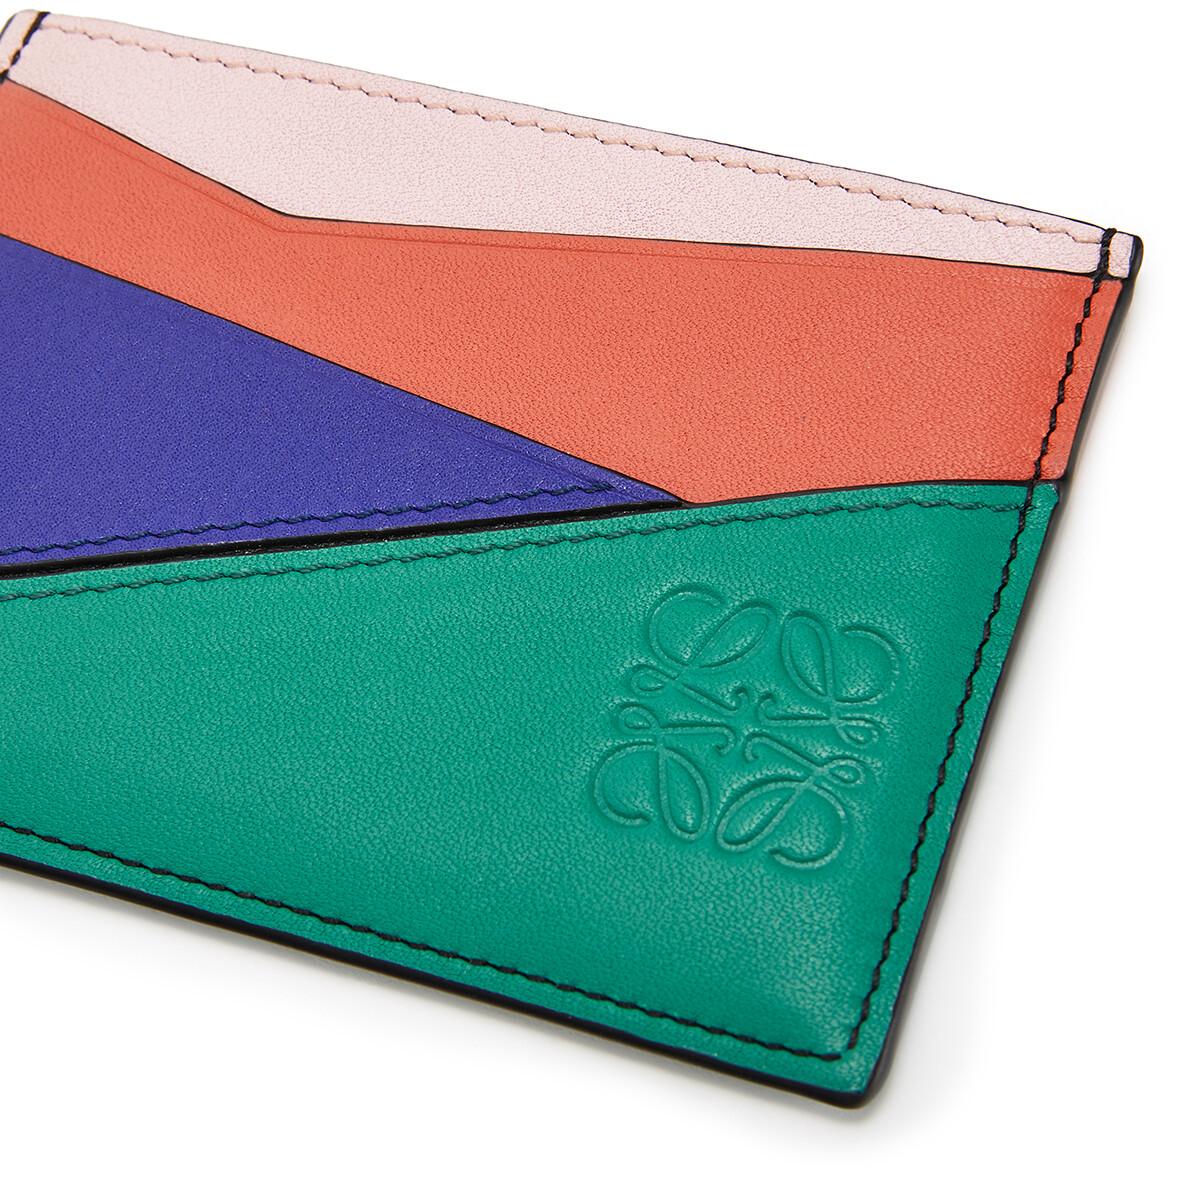 LOEWE Puzzle Plain Cardholder Emerald Green front